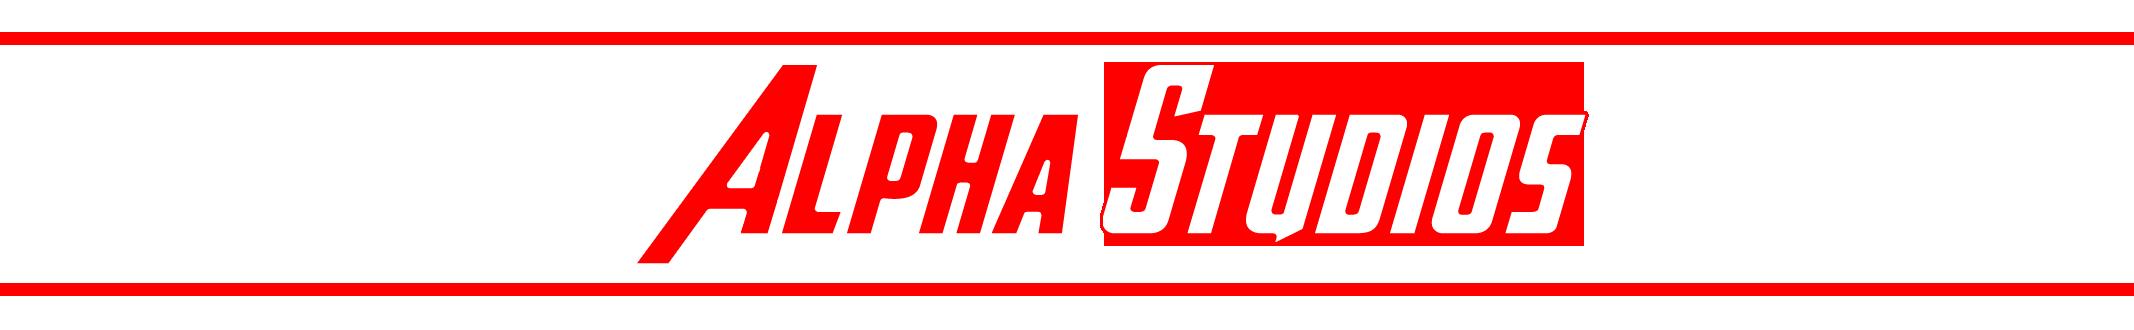 AlphaStudiosLogo2.png